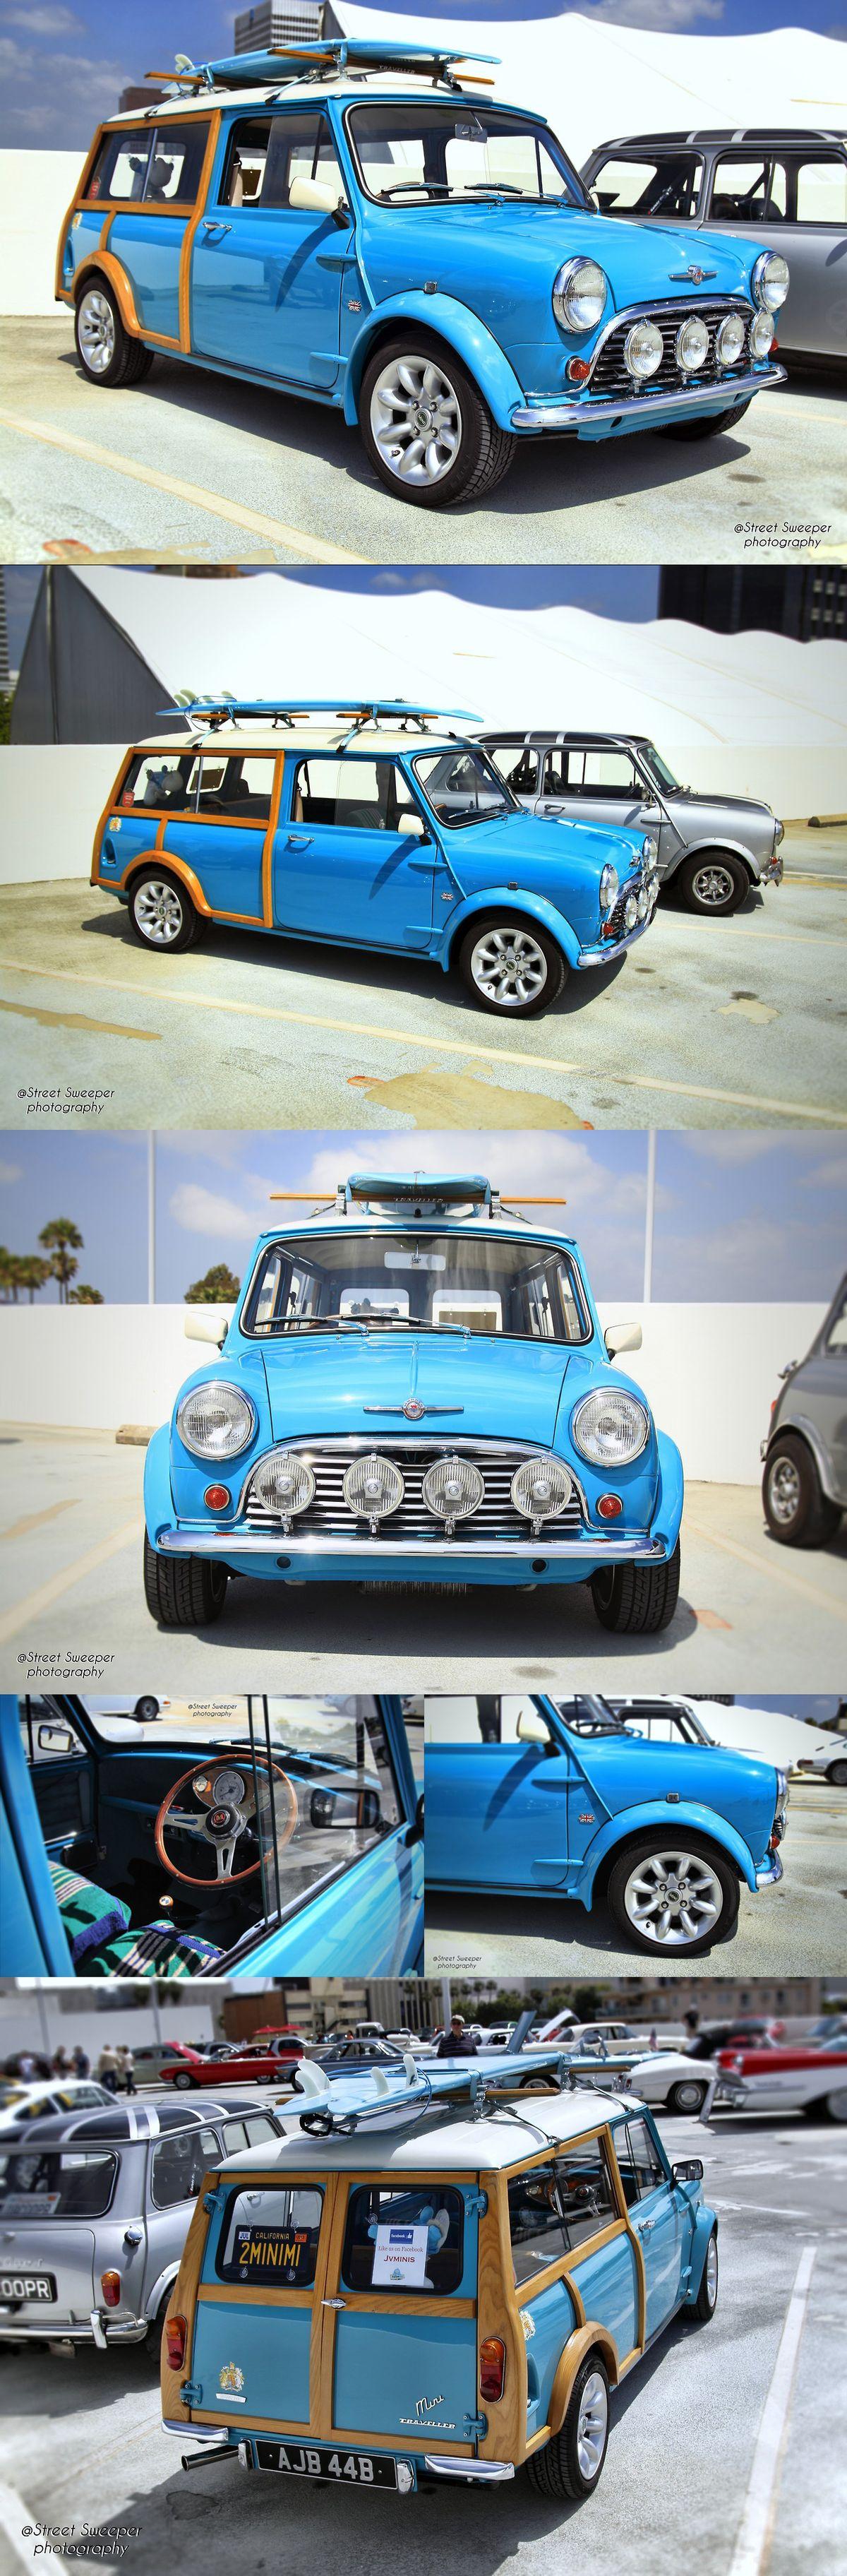 9e0f4e2e3a78486964450f0d174f98f0 Jpg 1 200 3 648 Pixels Mini Cooper Mini Cooper Classic Classic Mini